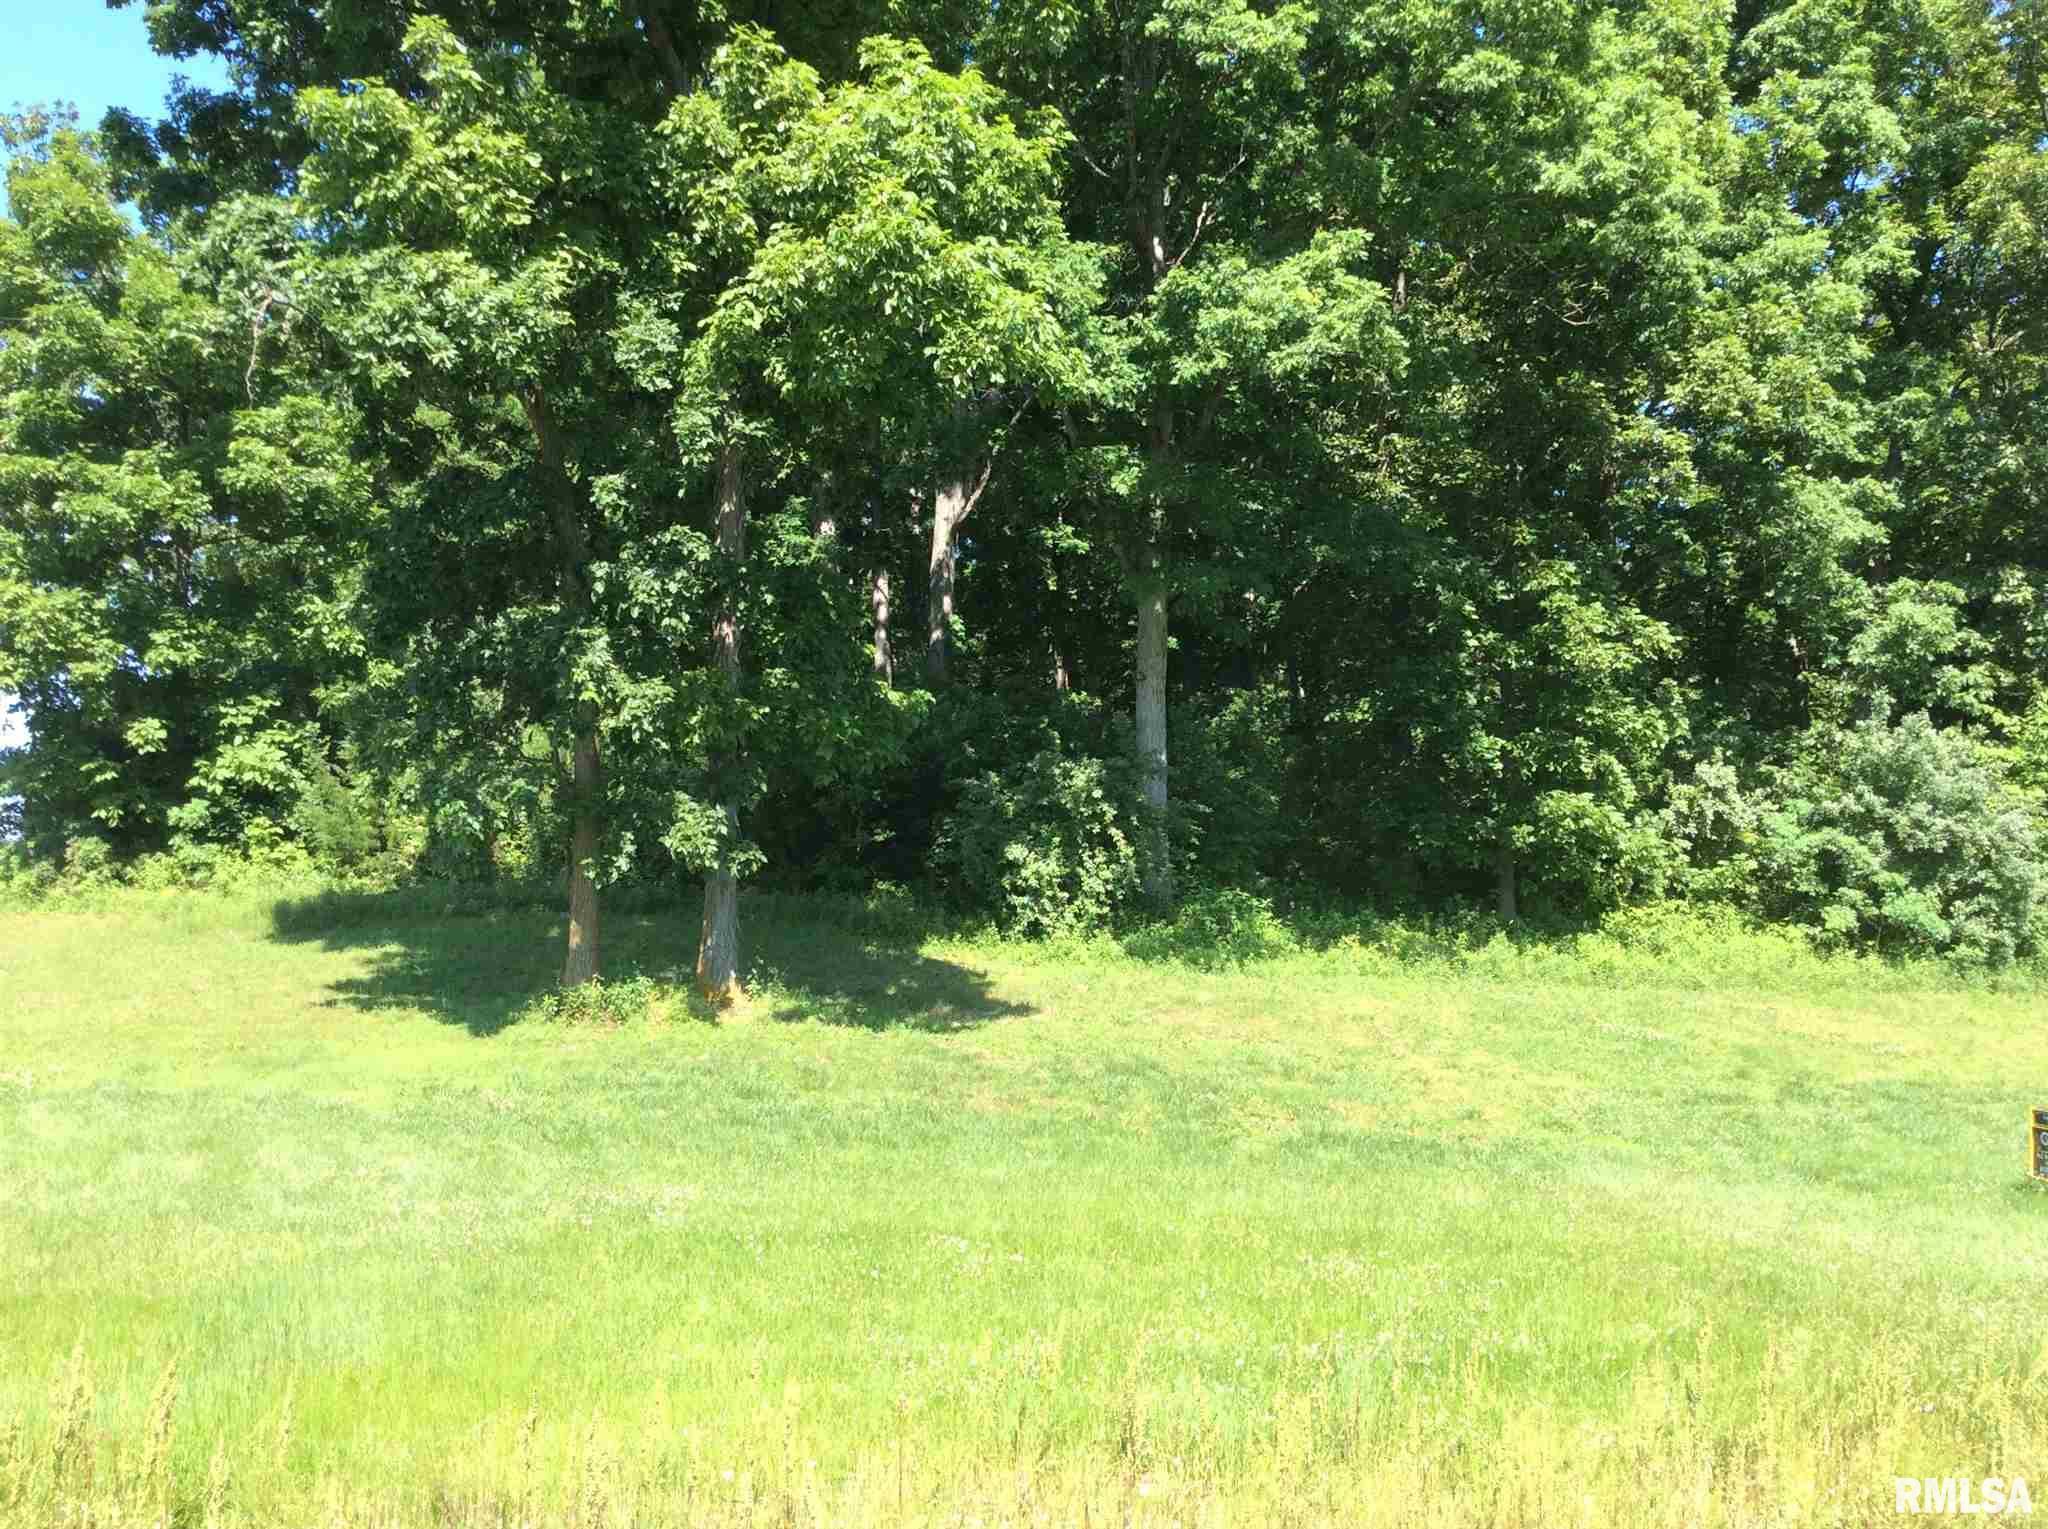 000 N WOODLAWN Property Photo - Woodlawn, IL real estate listing